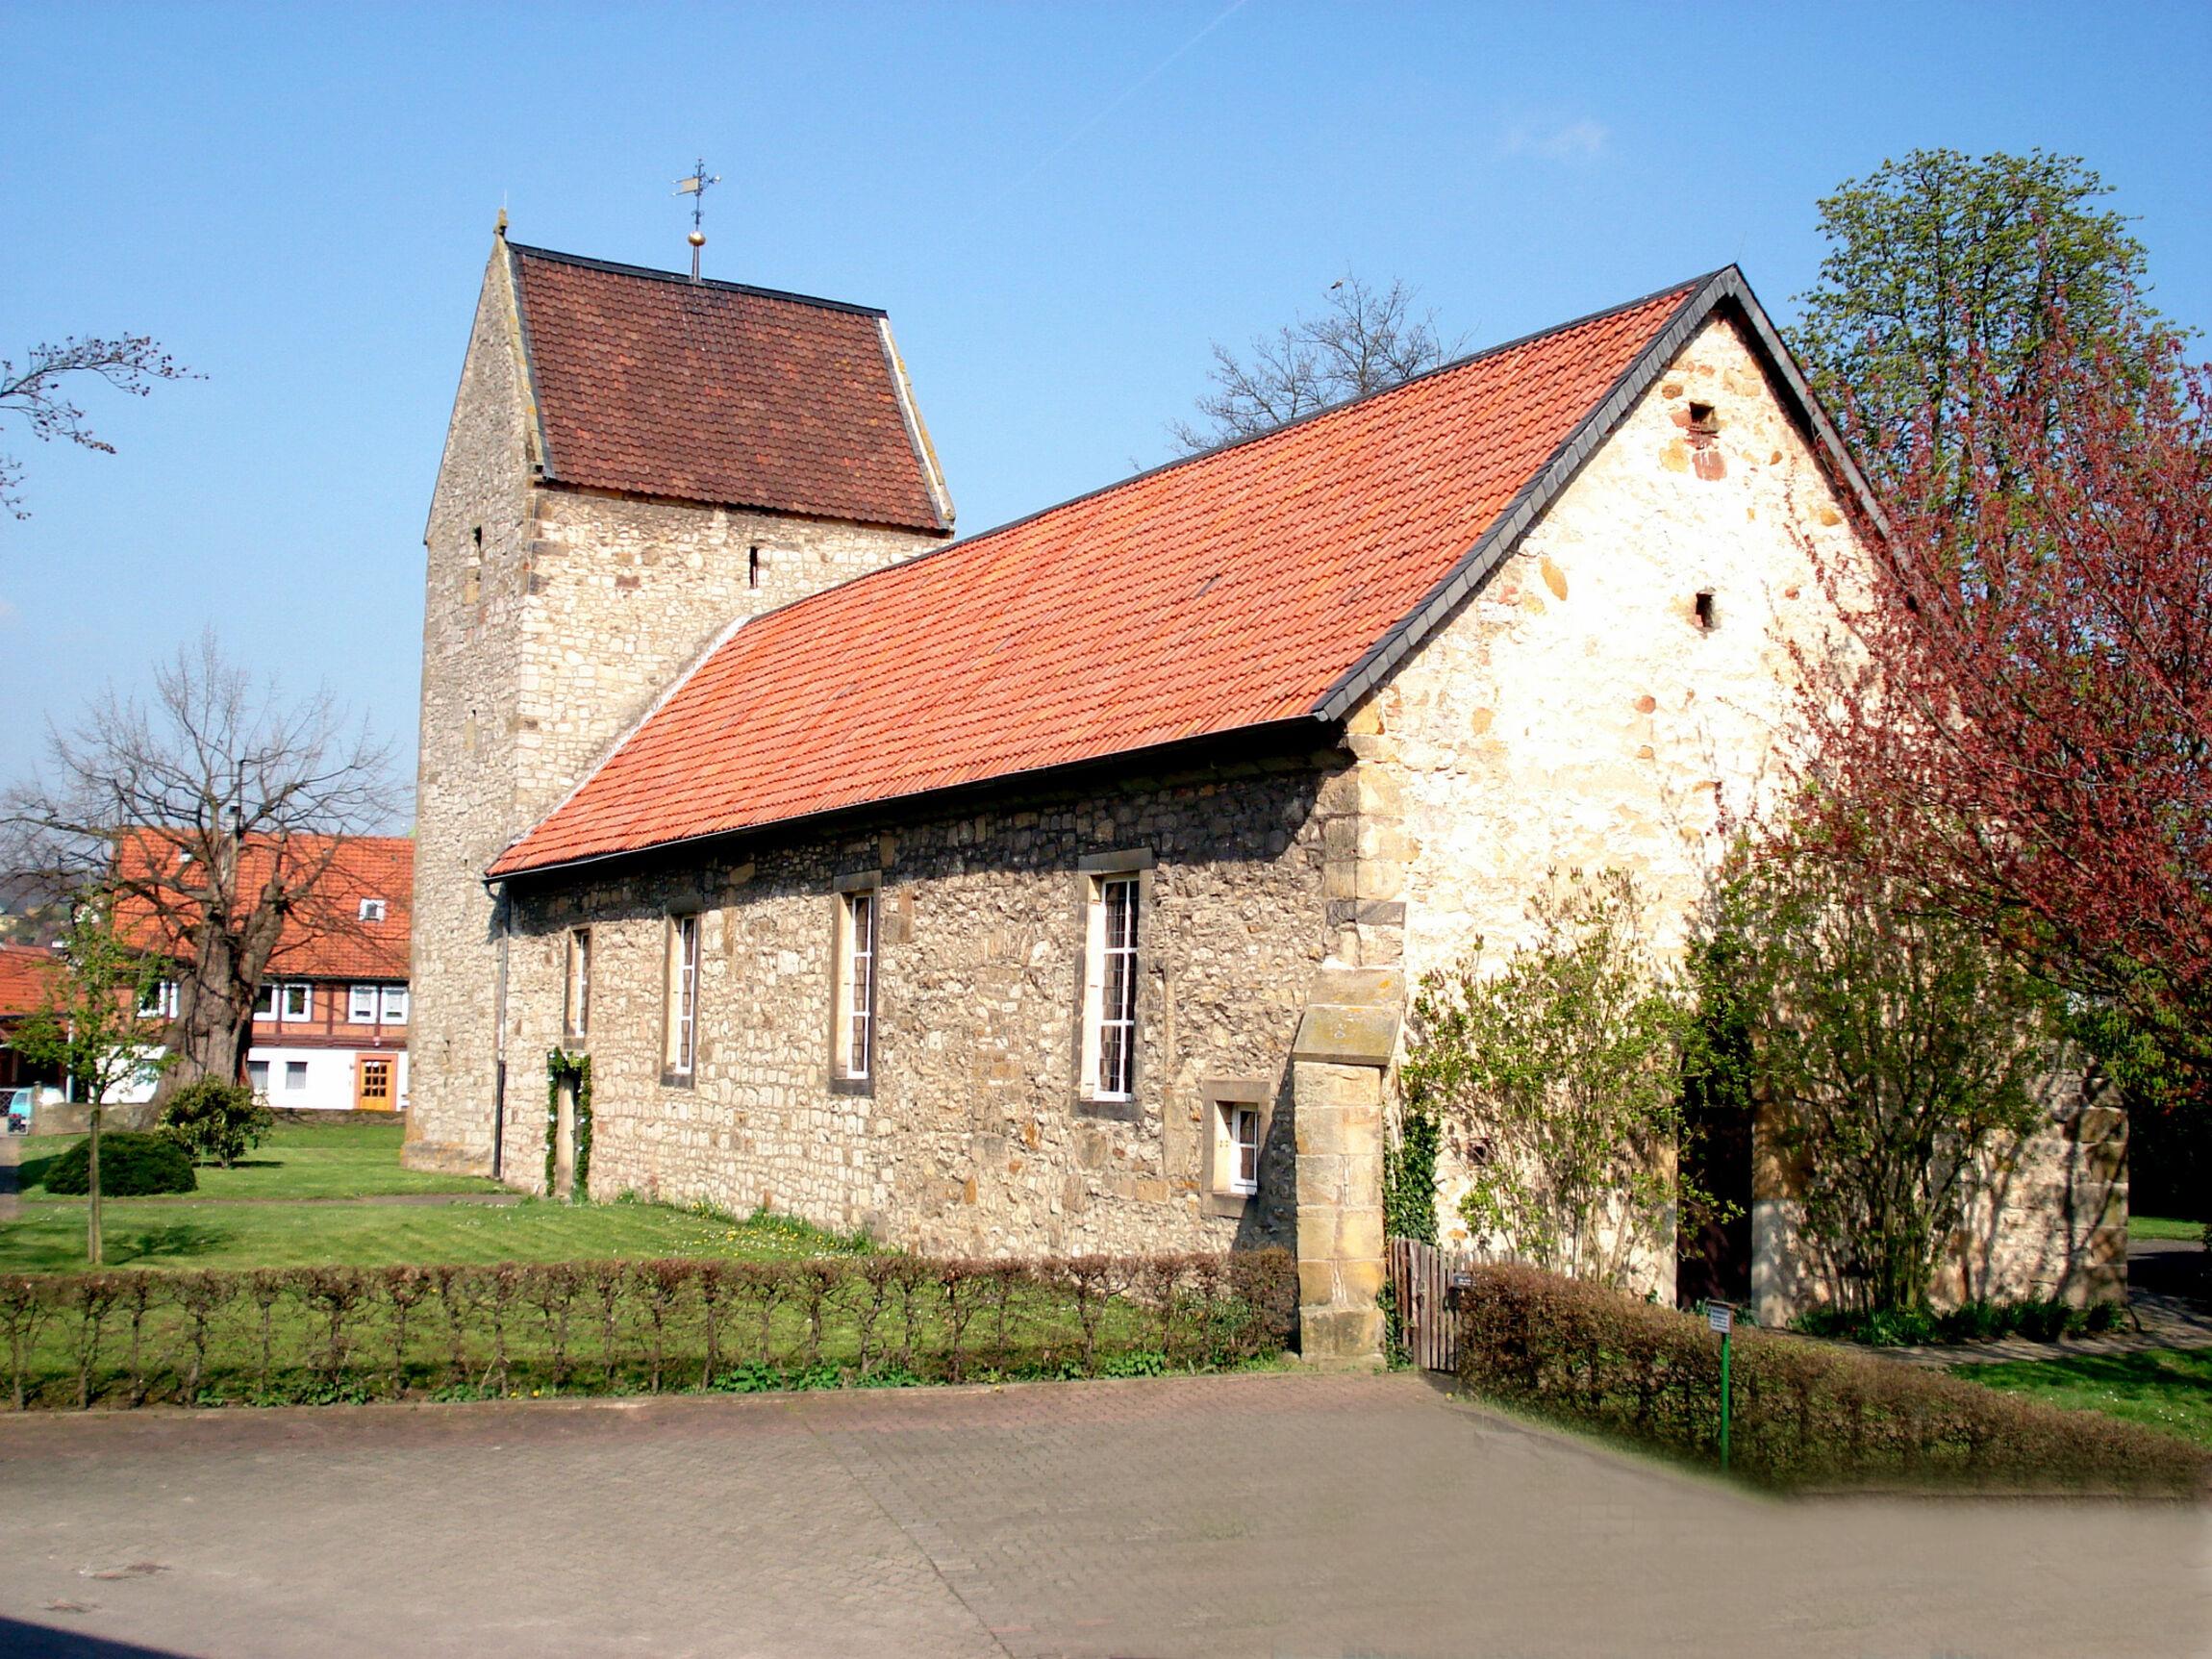 Martin-Luther-Kirche, Sottrum